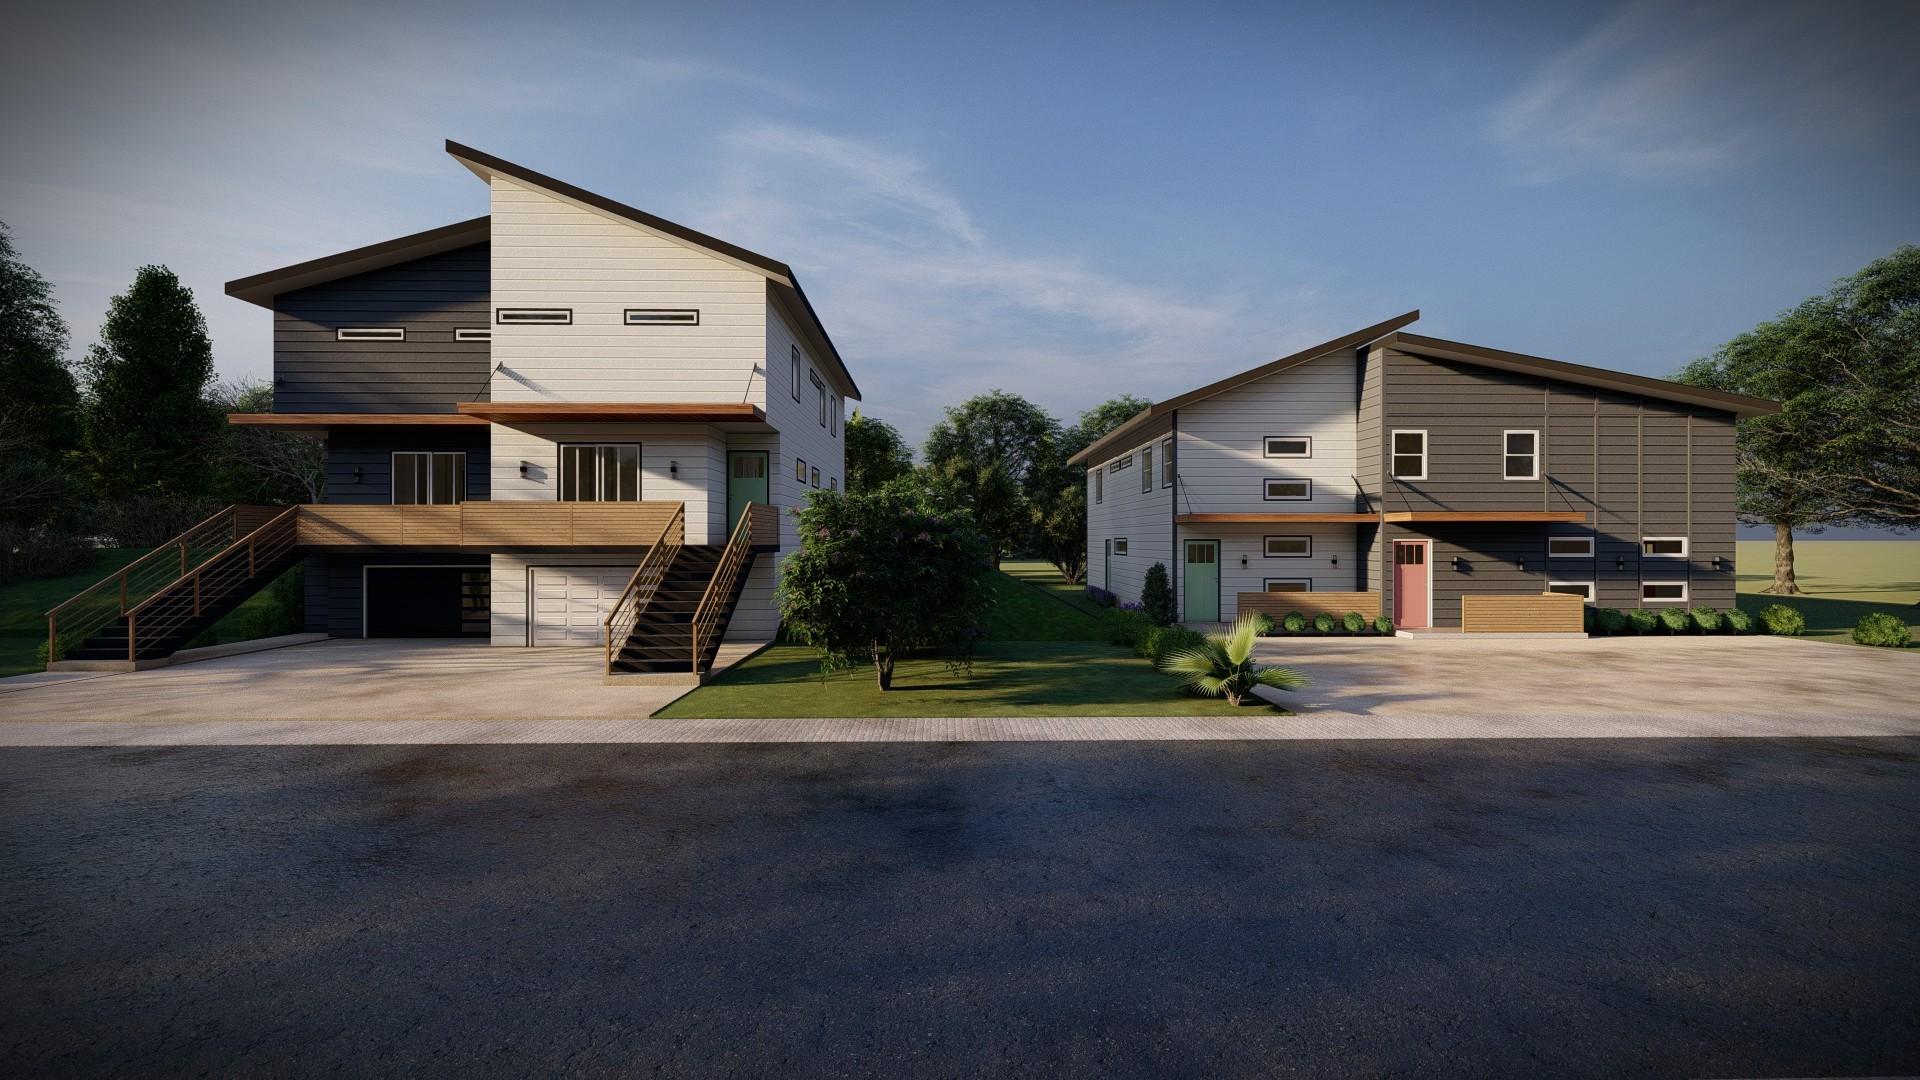 2306 Lloyd Ave #A Property Photo - Nashville, TN real estate listing